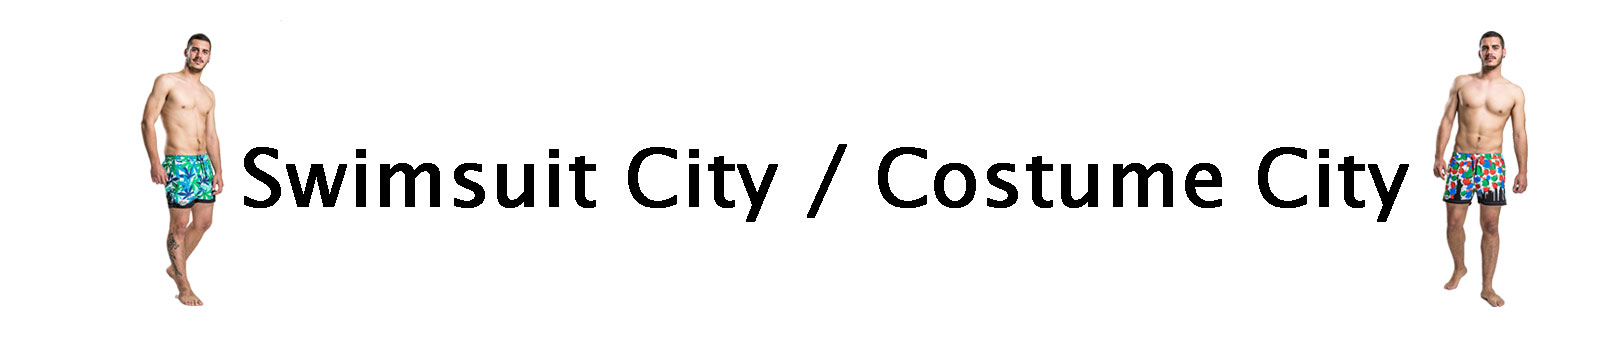 Banner Swimsuit City Costume City